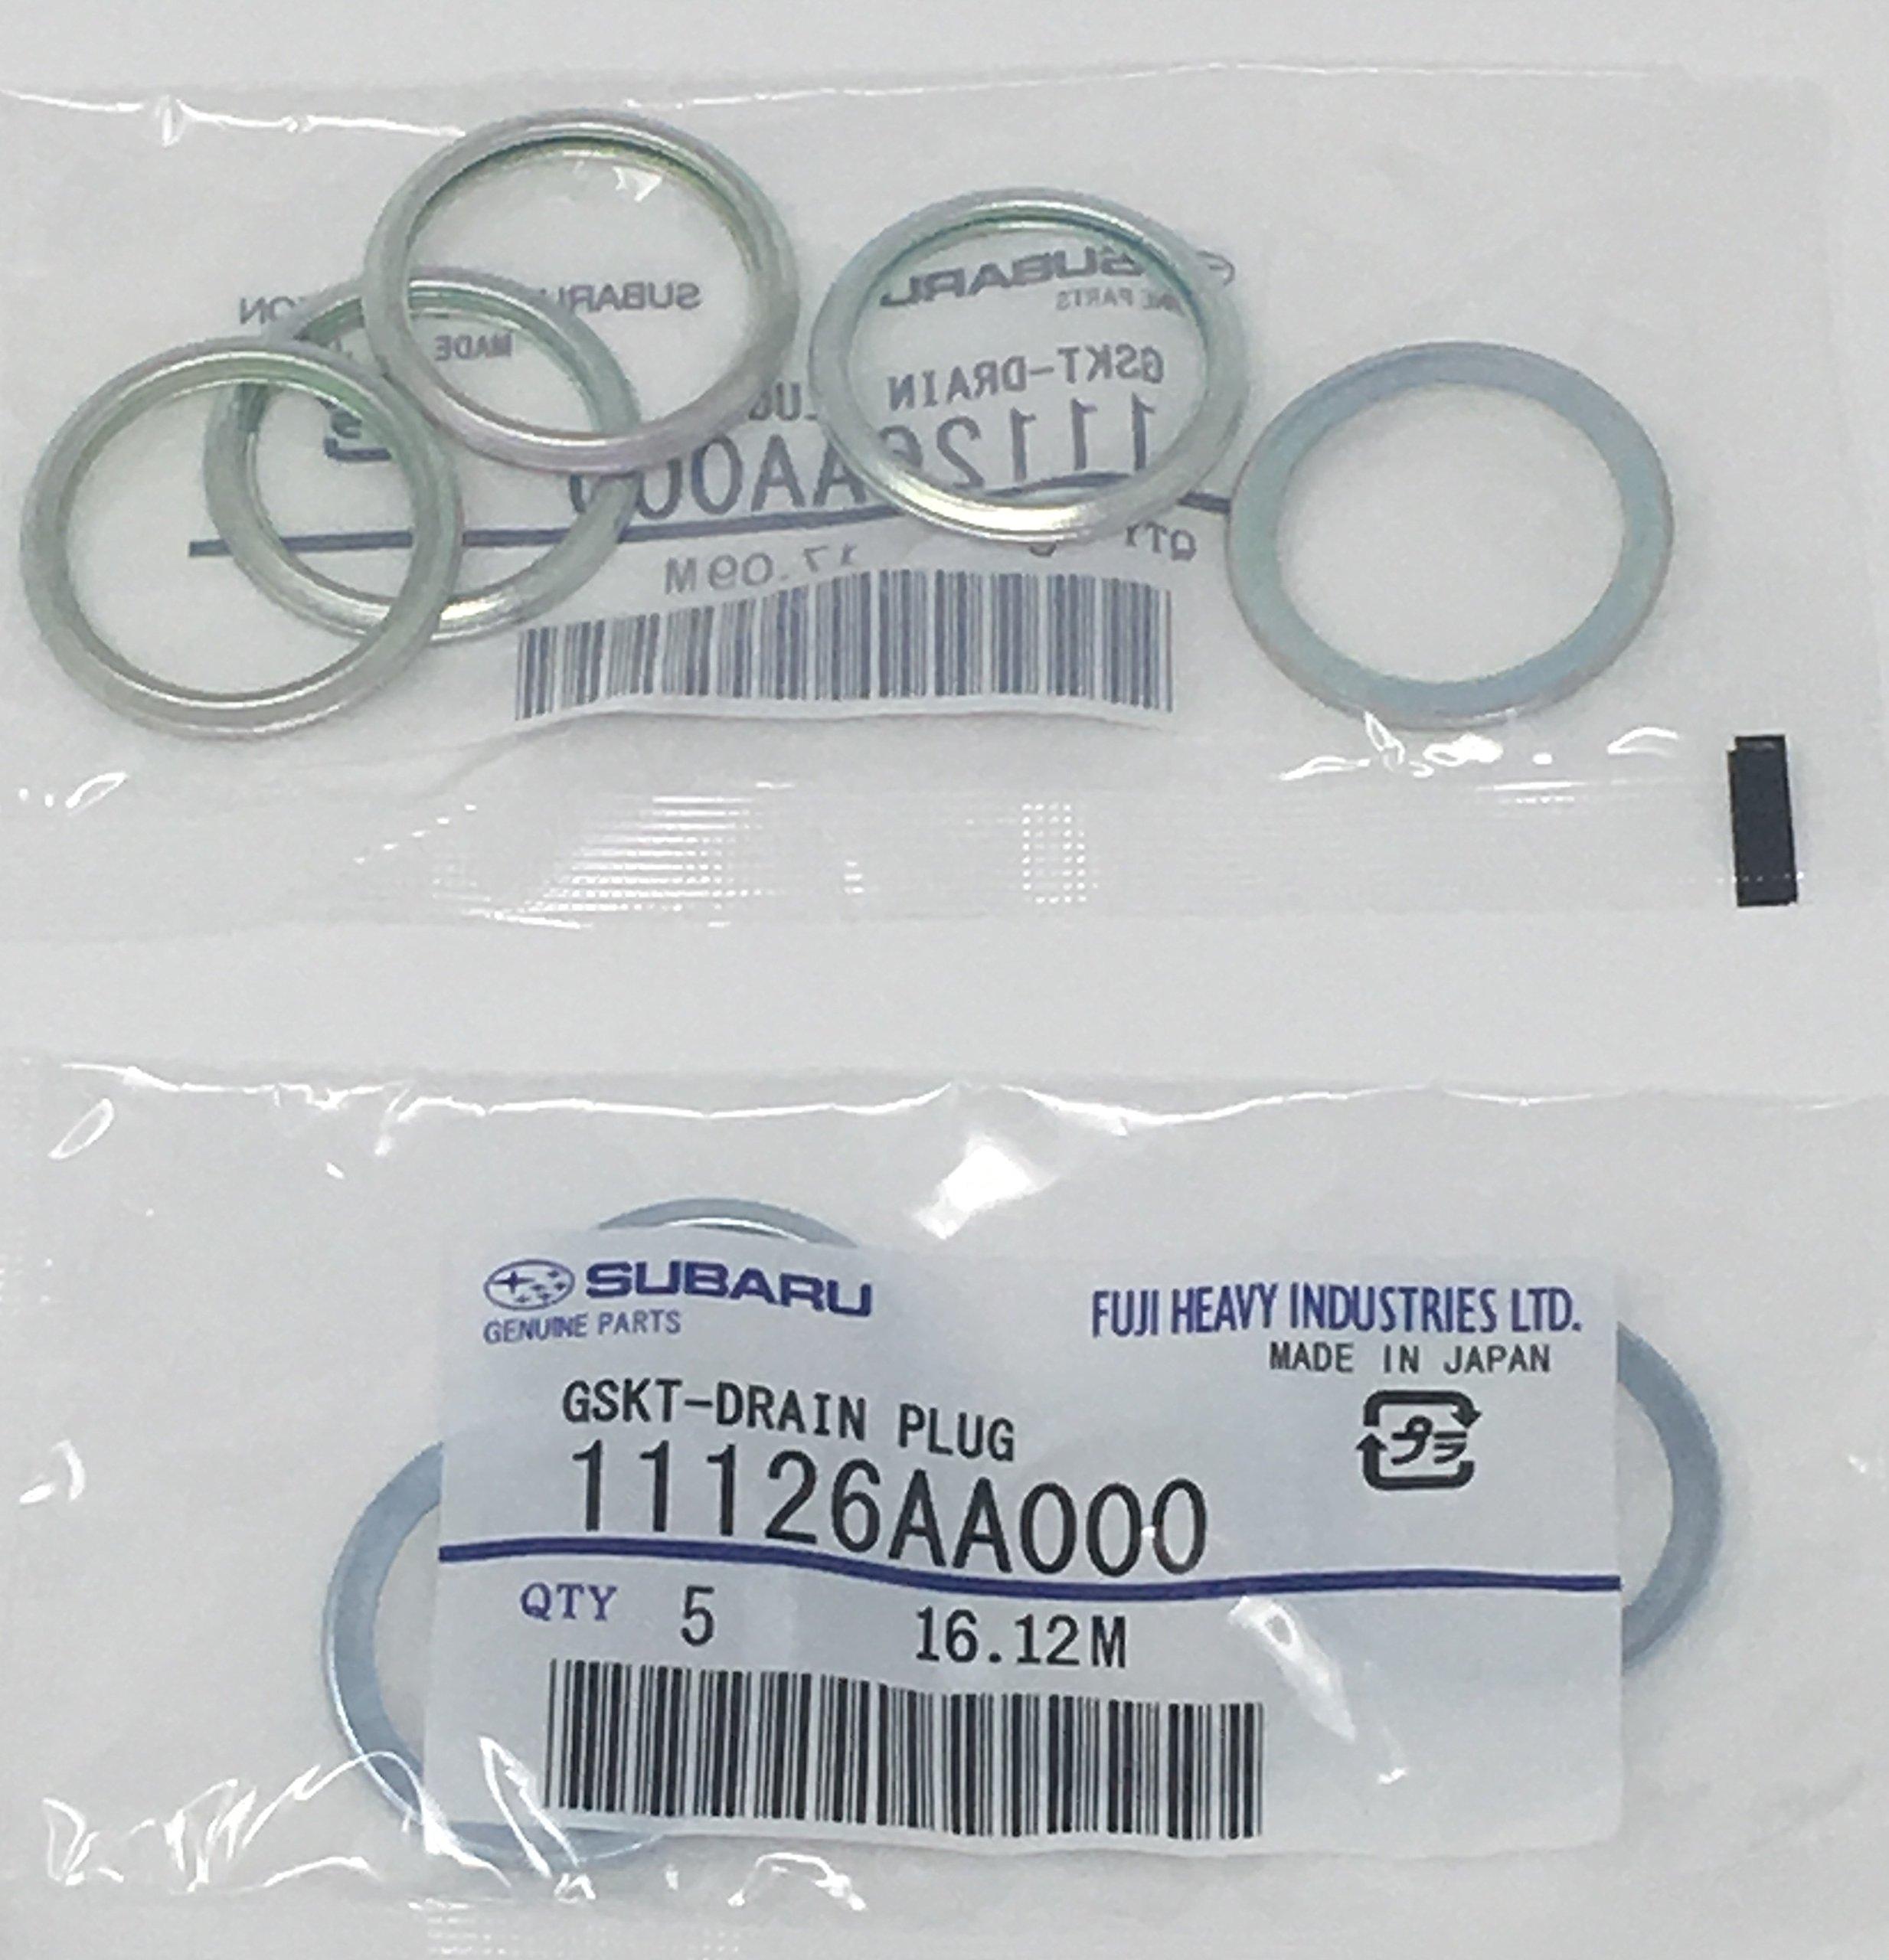 SUBARU GENUINE OEM 1985-2018 Subaru Oil Drain Plug Crush Washer Gasket SET OF 10 NEW 11126AA000